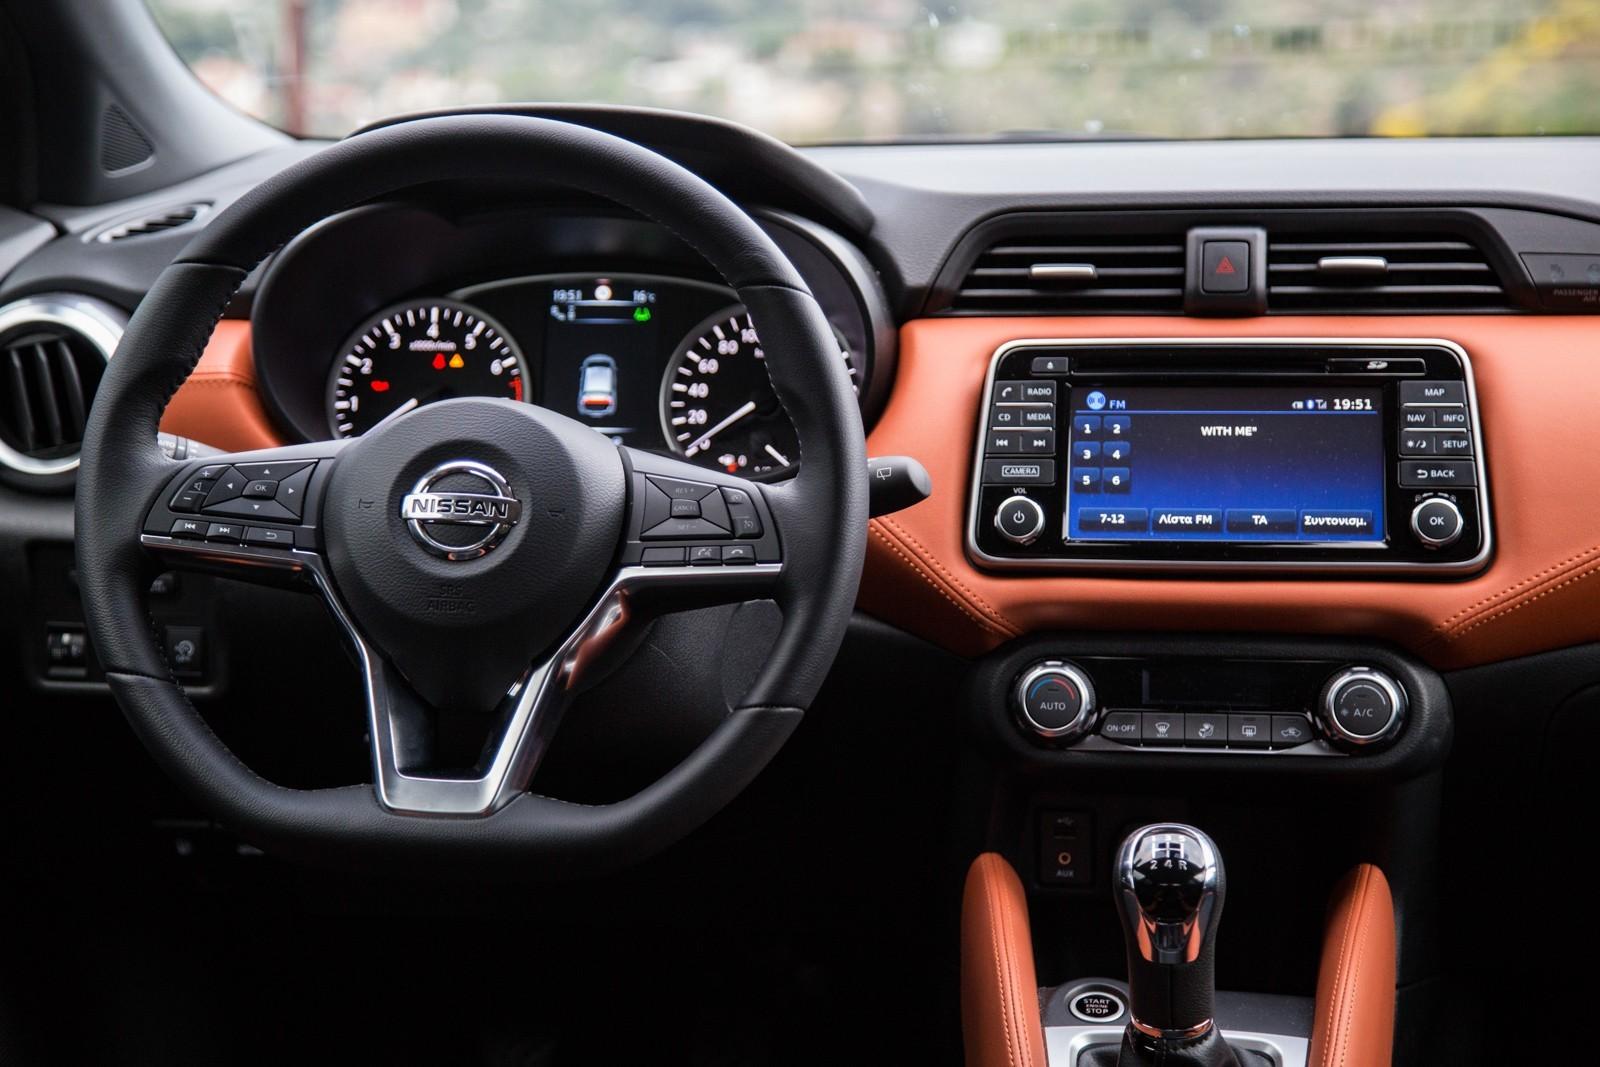 Test_Drive_Nissan_Micra_IG-T_90_40